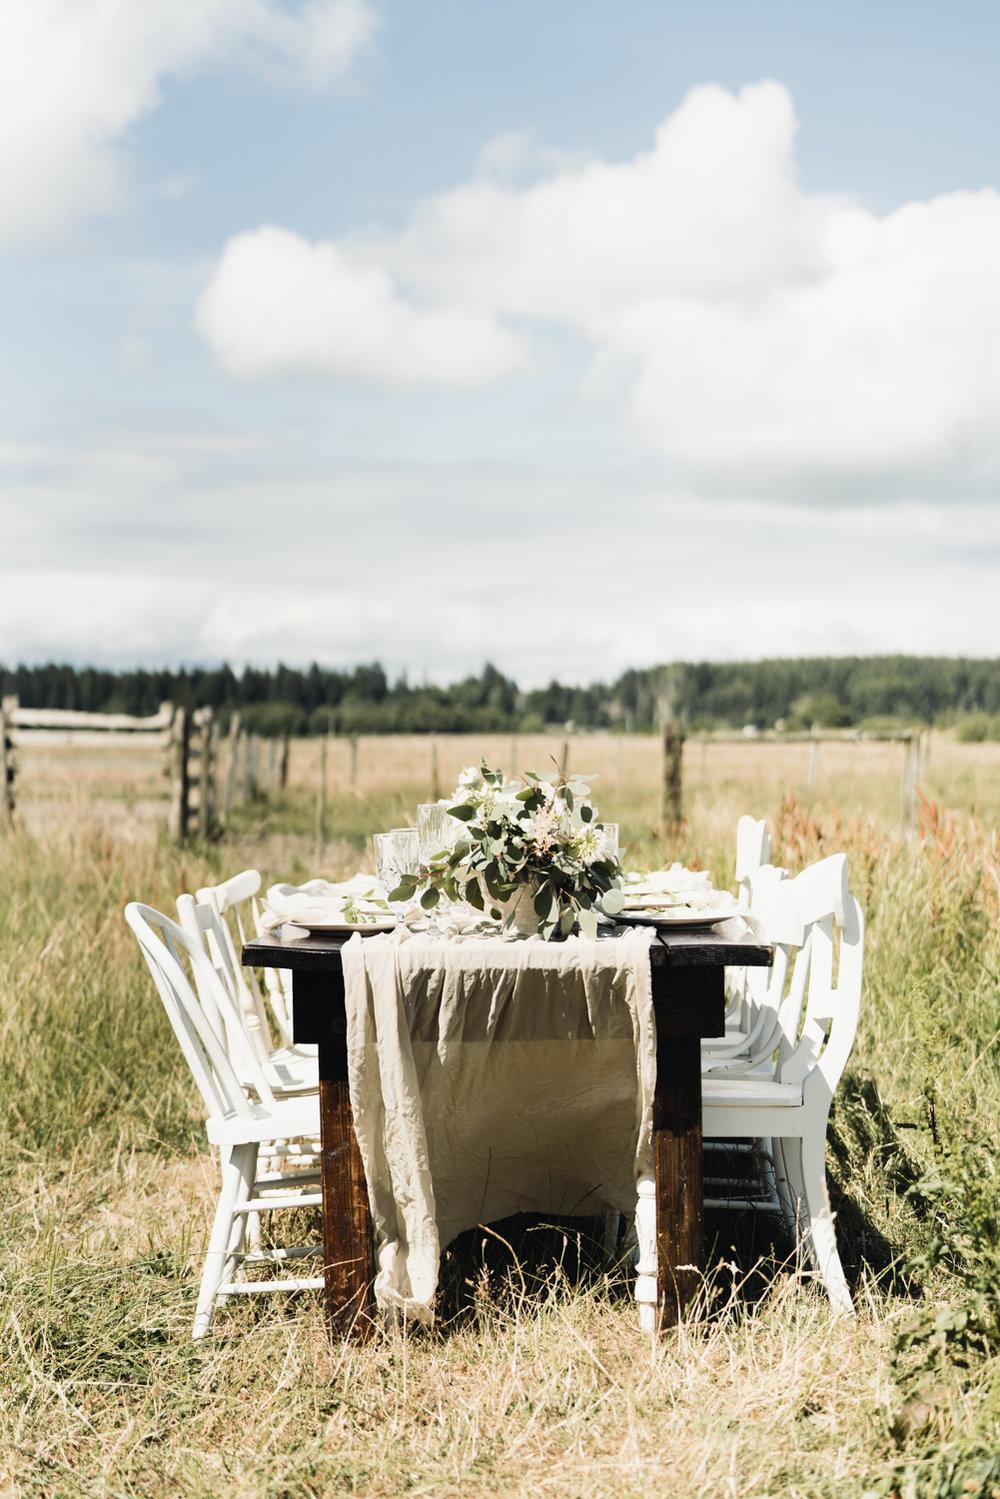 April Yentas Photography - South Bend Shoot-1.jpg